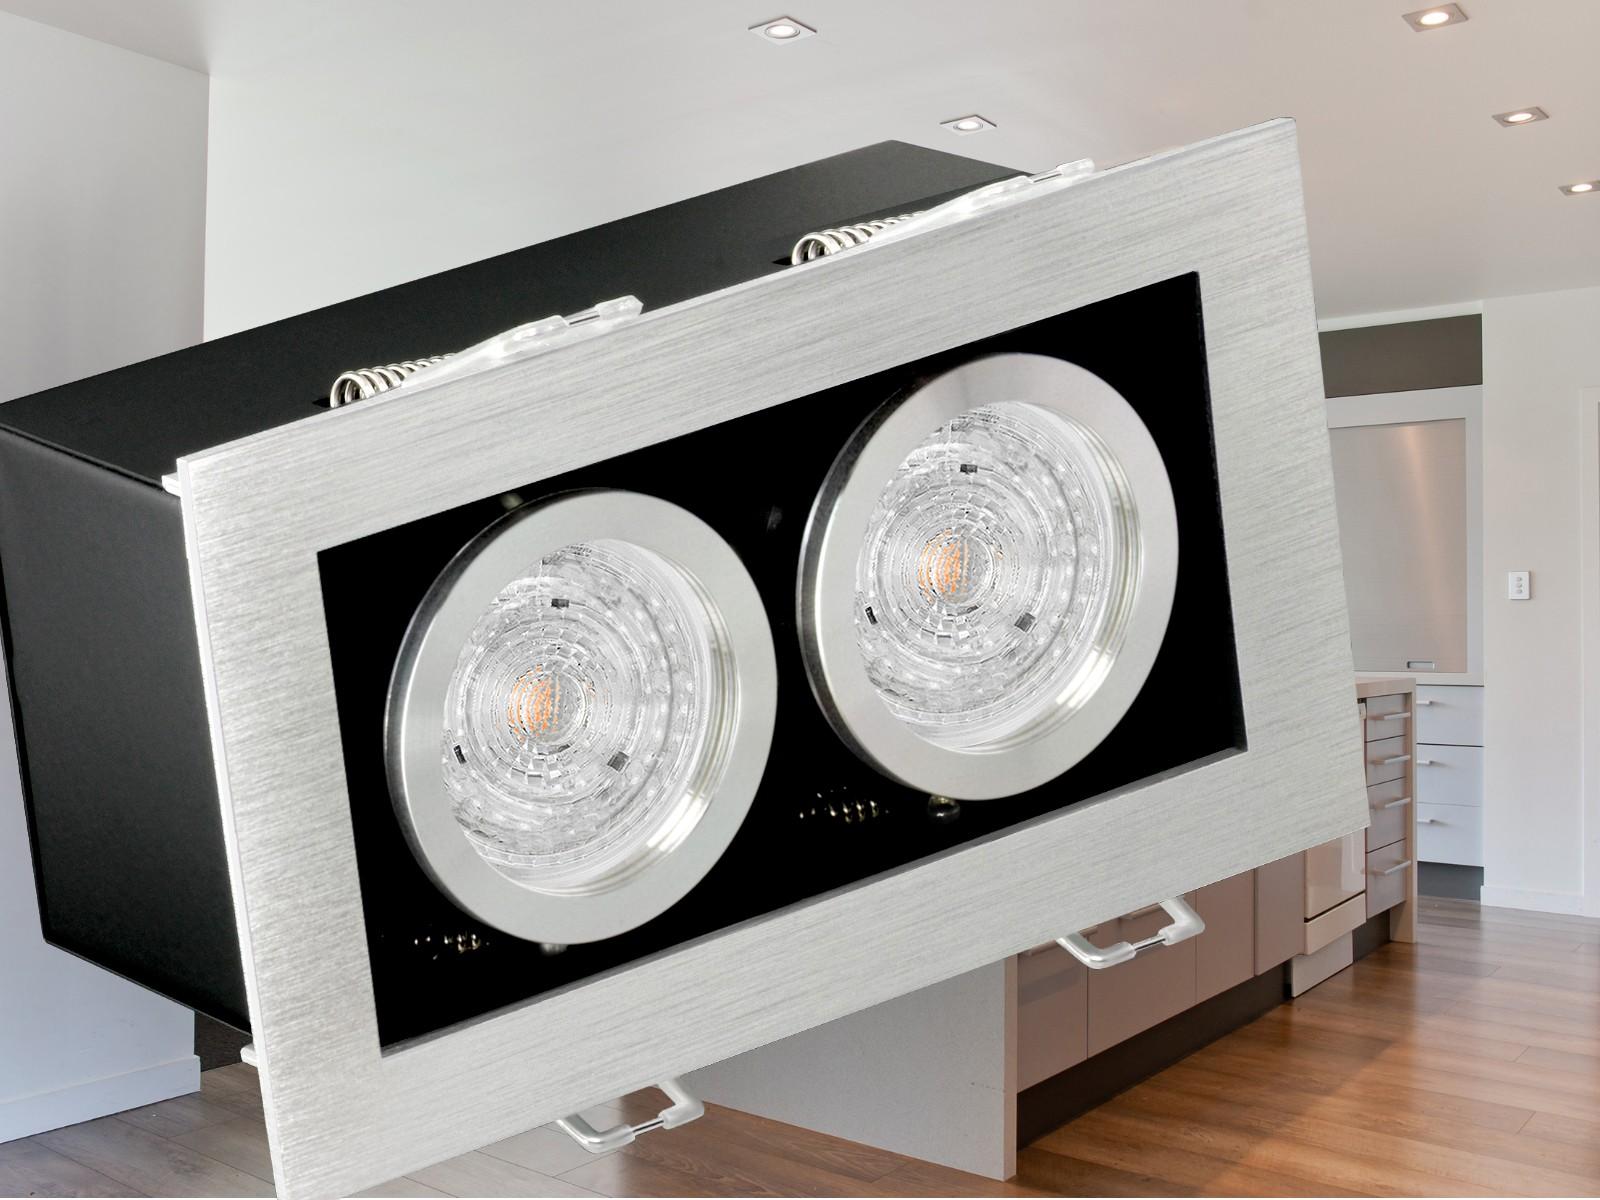 K2-Master-Decke-1600x1200 Schöne Osram Led Dimmbar Gu10 Dekorationen